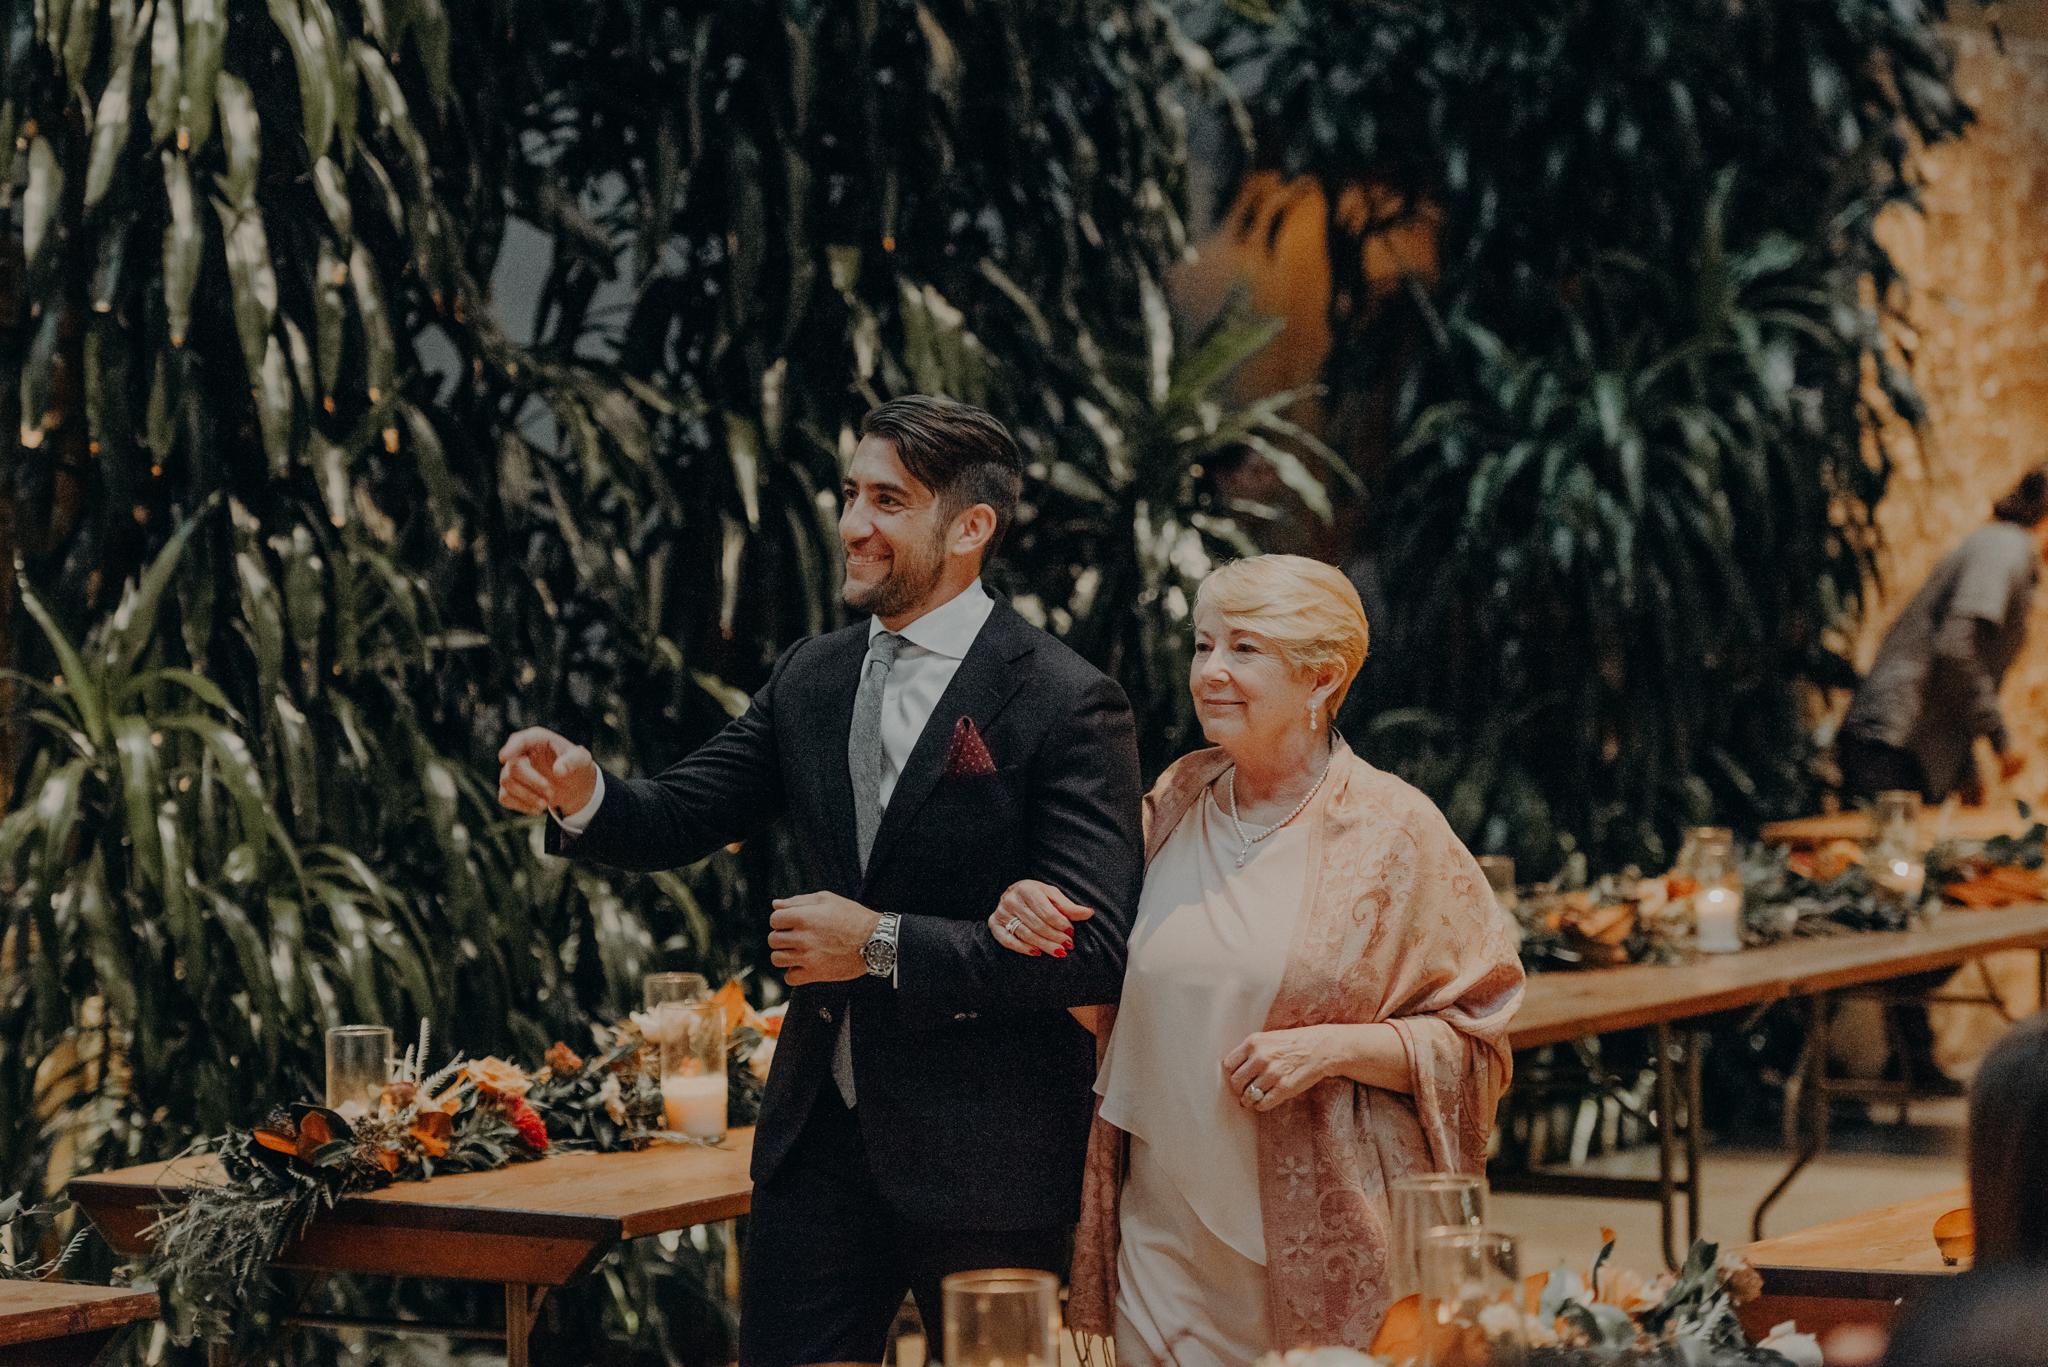 Wedding Photo LA - wedding photographer in los angeles - millwick wedding venue -isaiahandtaylor.com-091.jpg